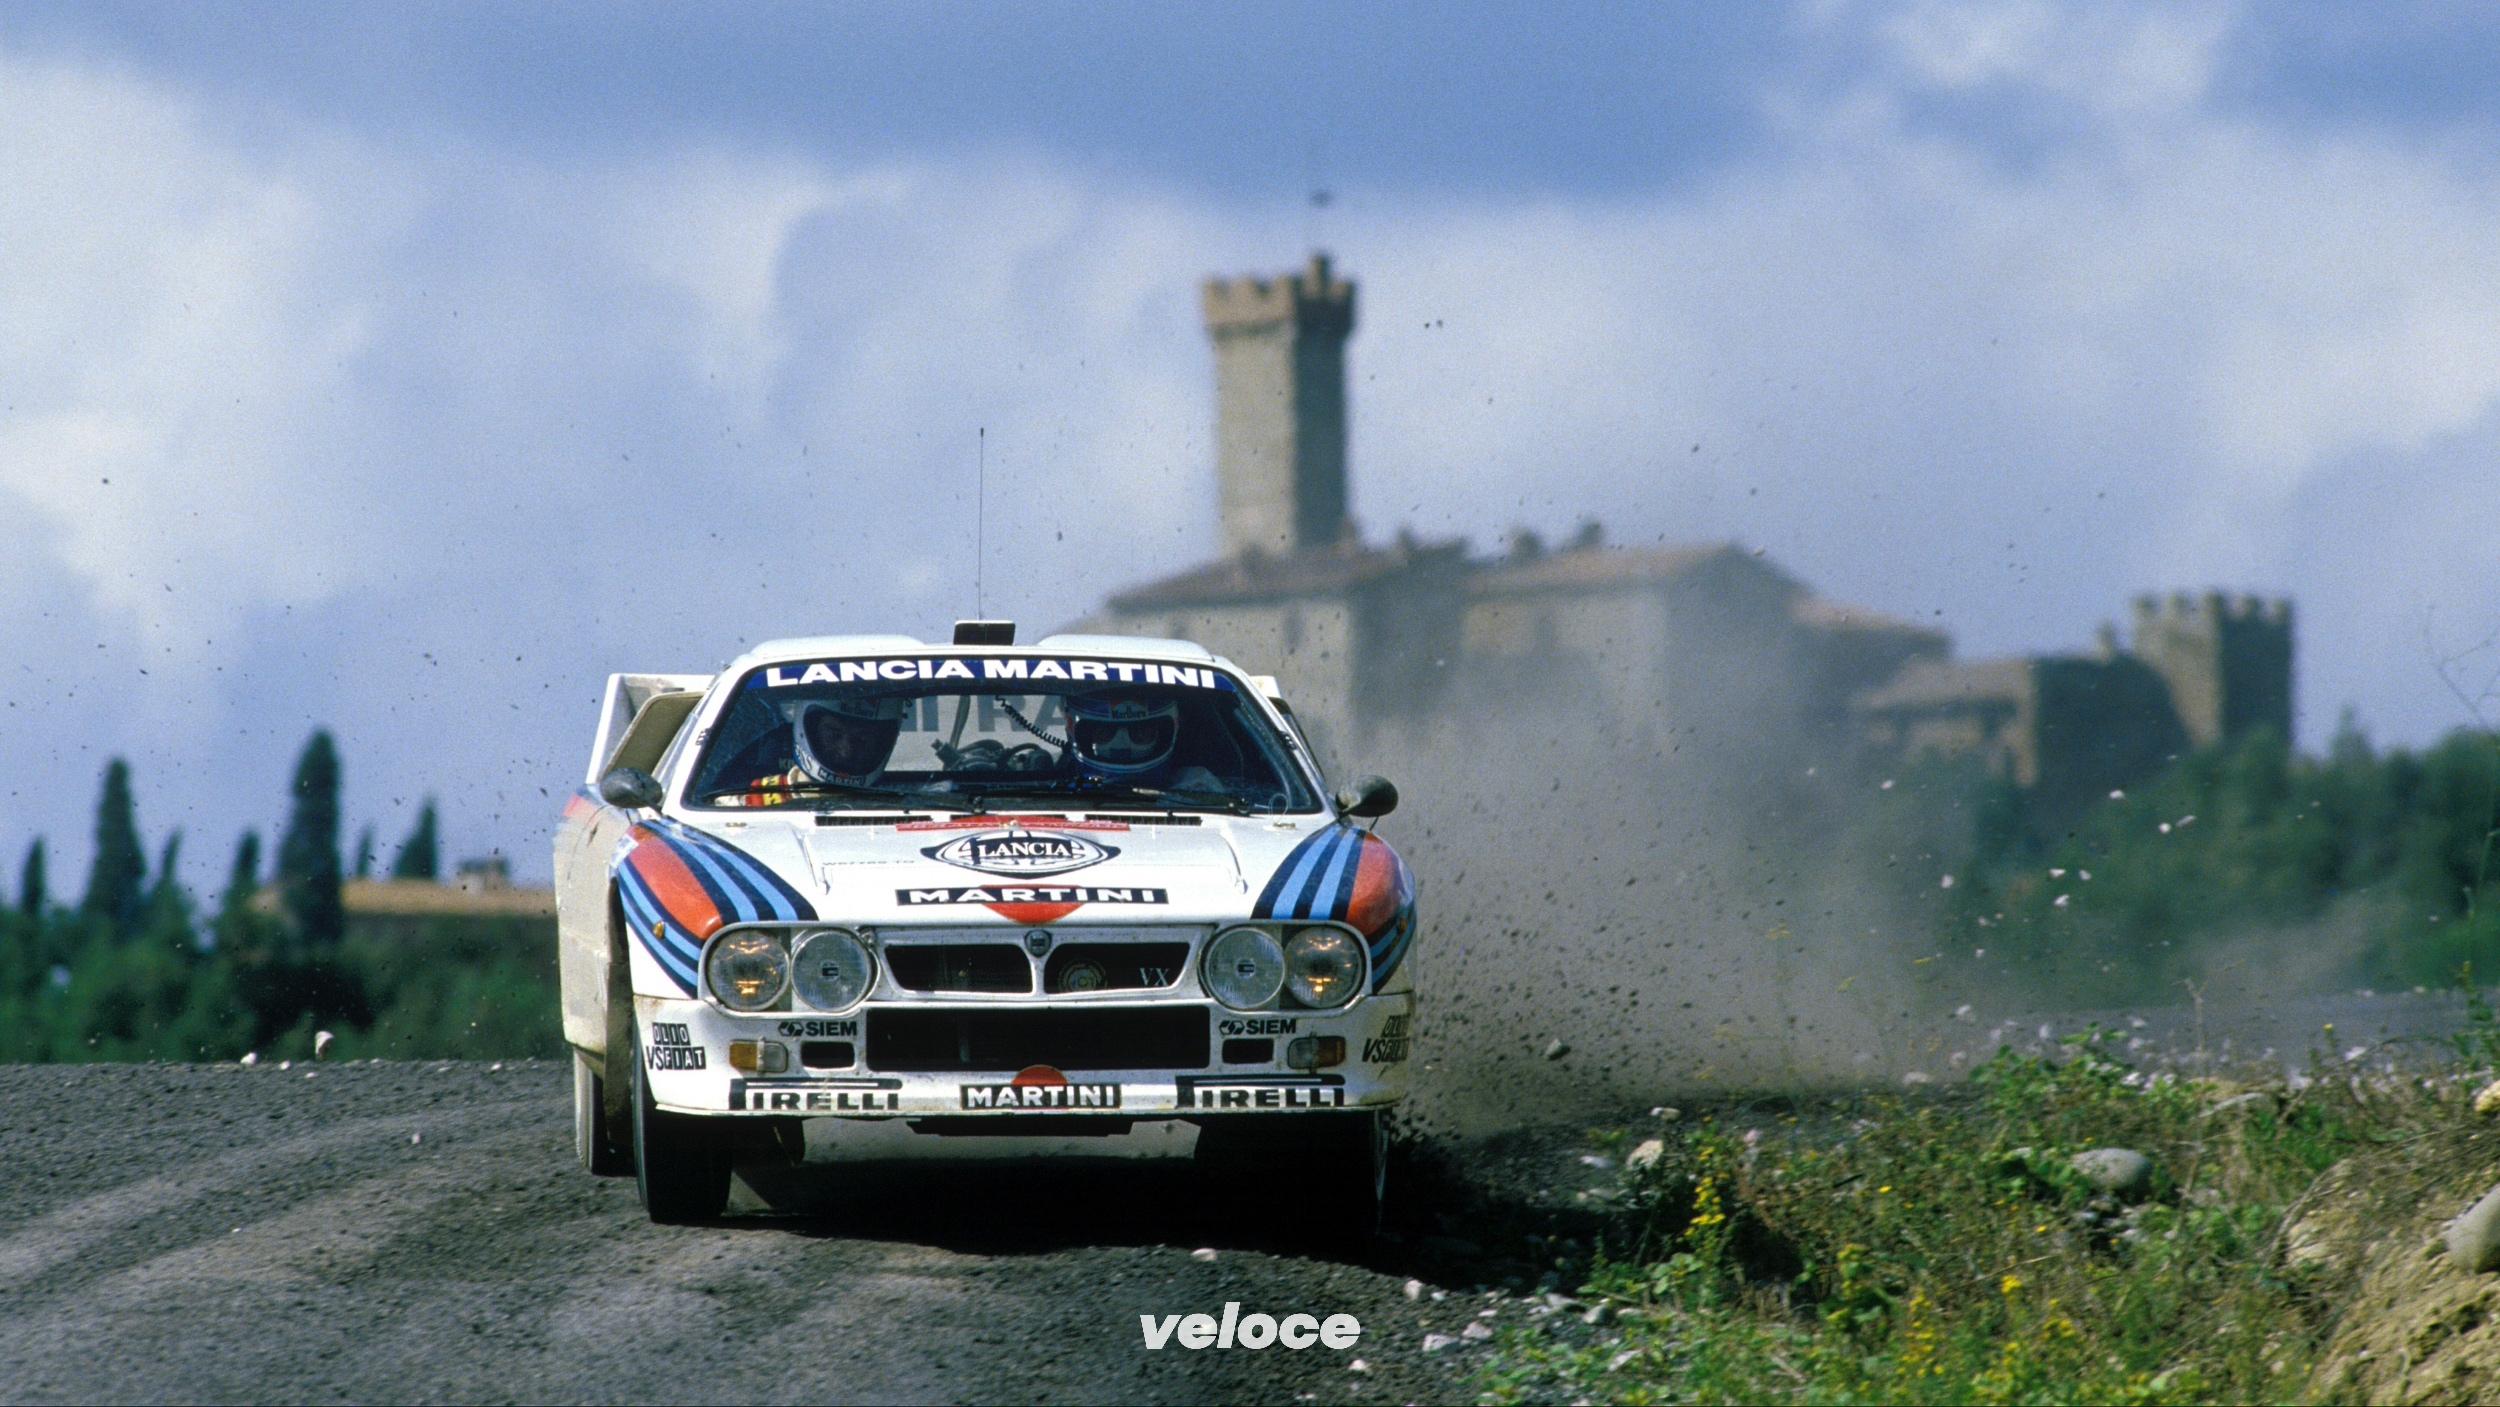 Lancia 037: i successi della regina 'posteriore'